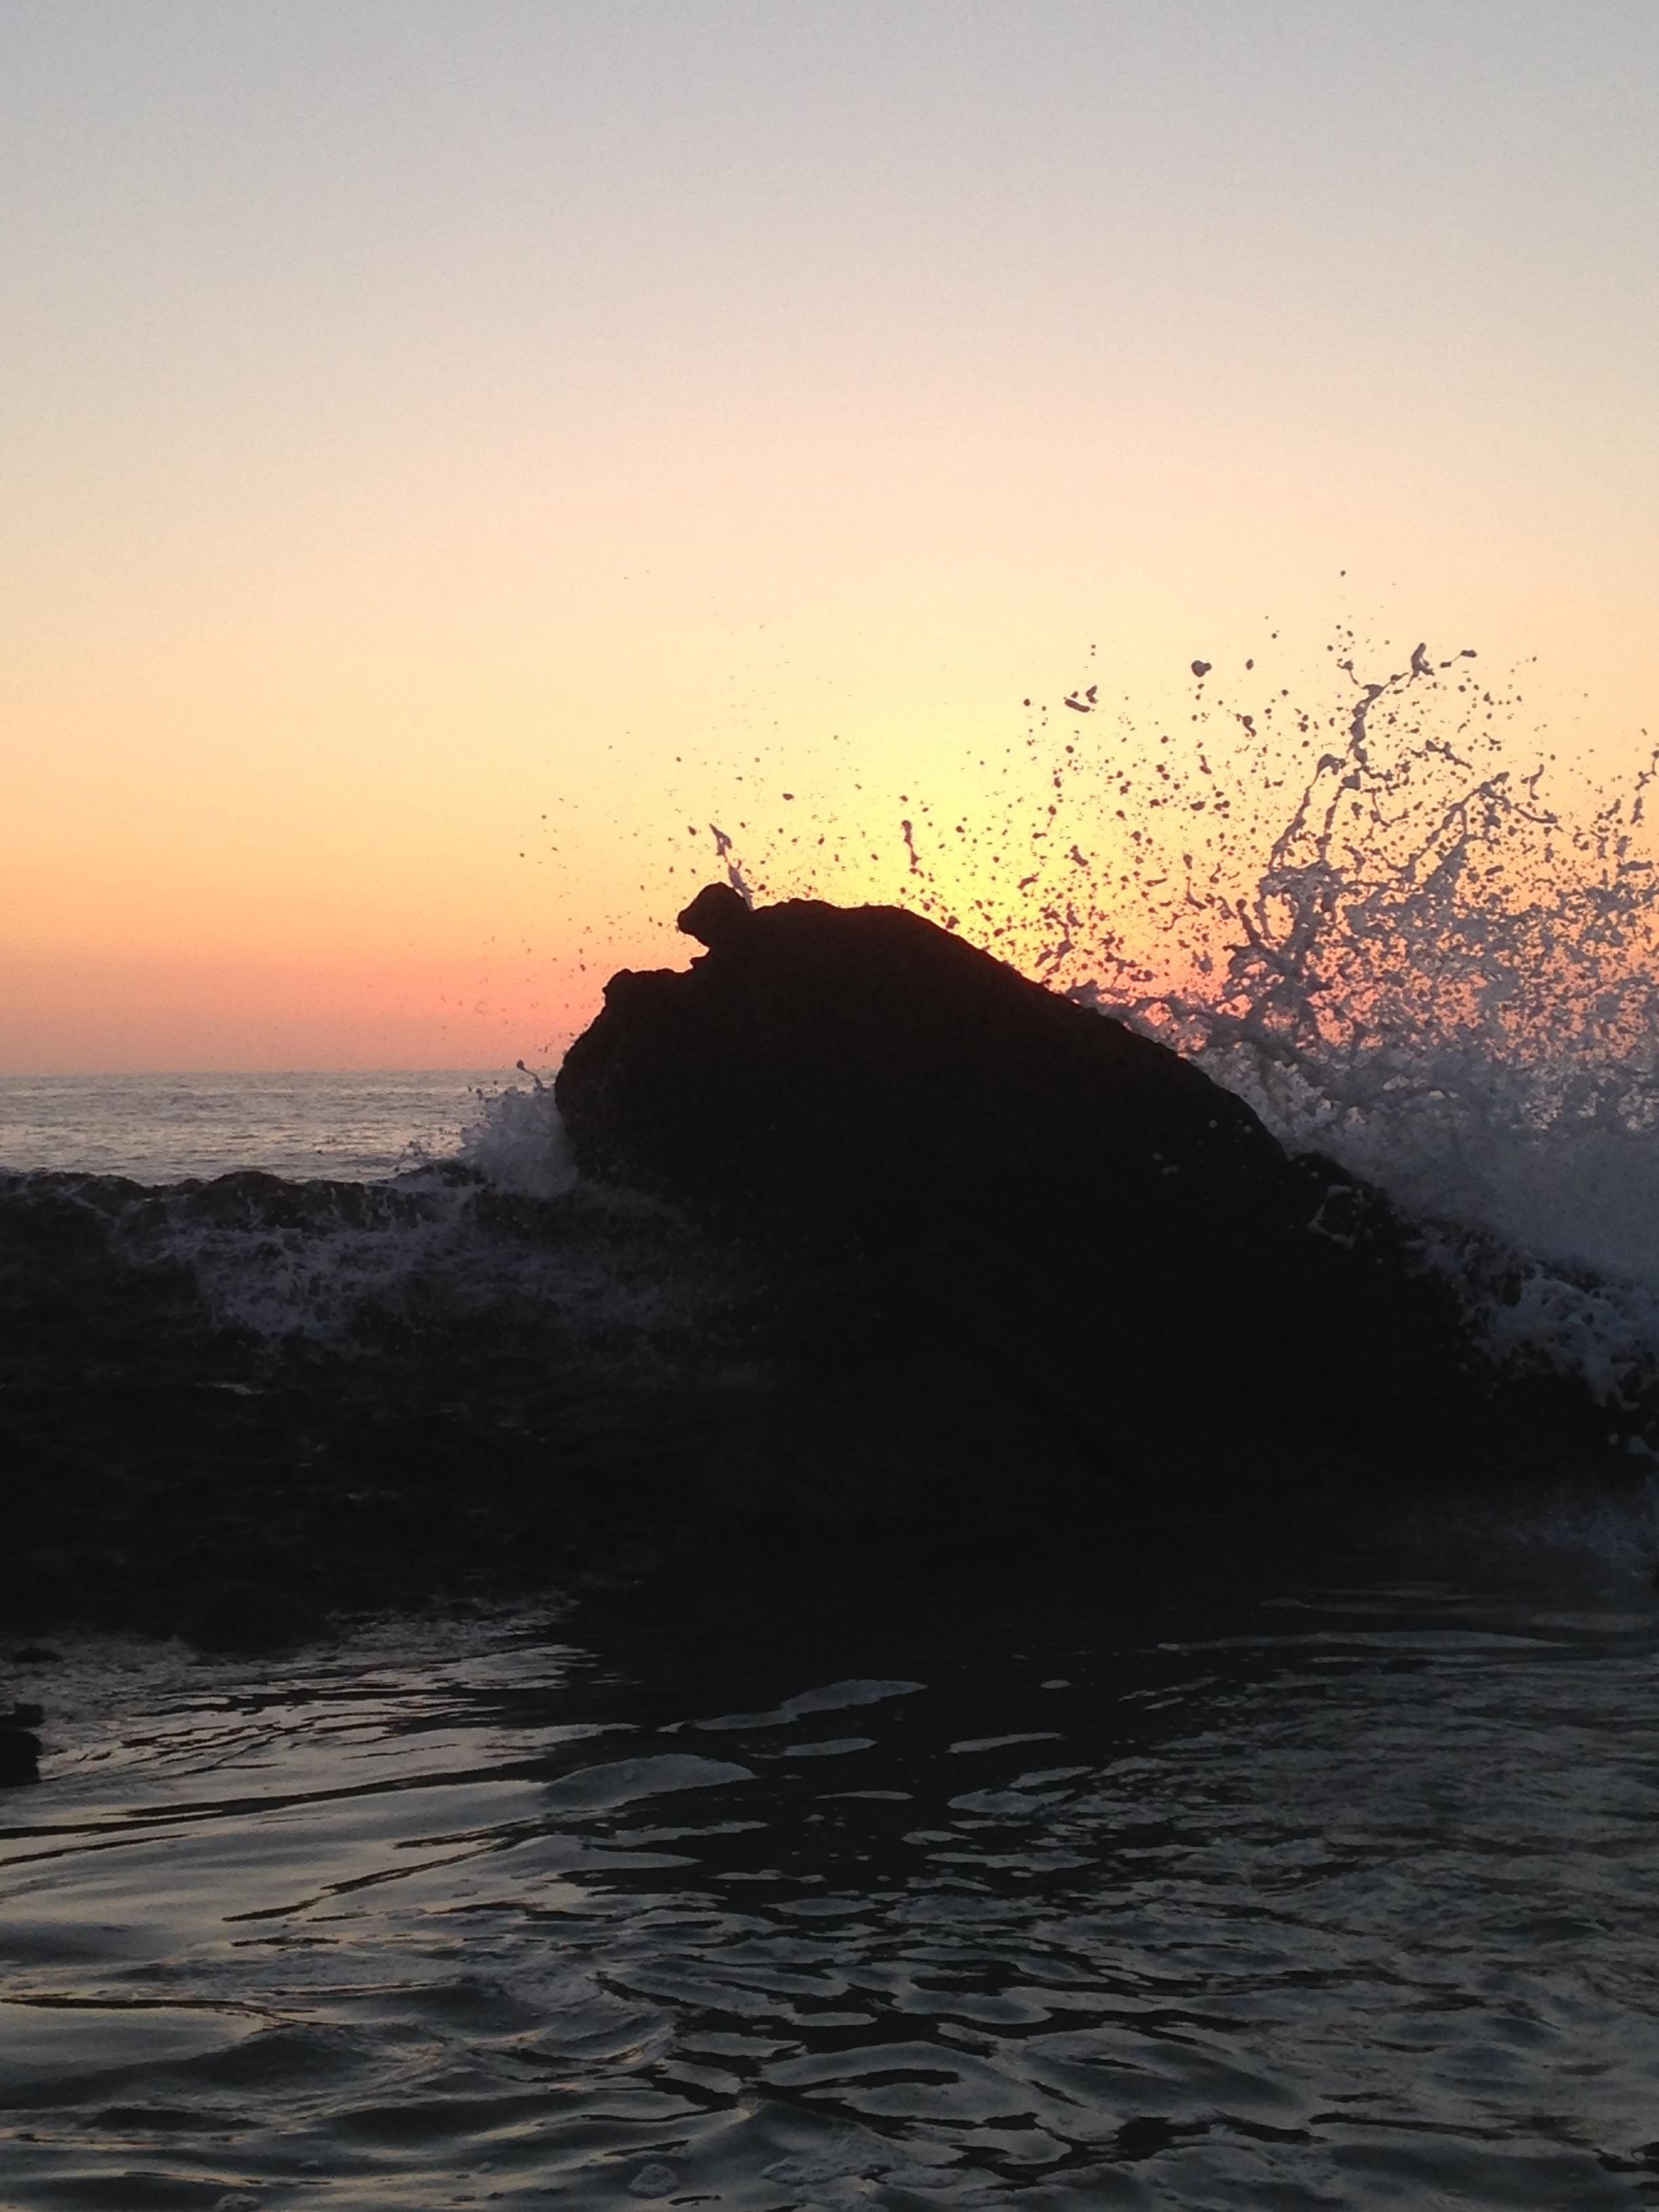 Waves crashing at the natural tide pools in Laguna Beach CA. [OC][2448x3264]